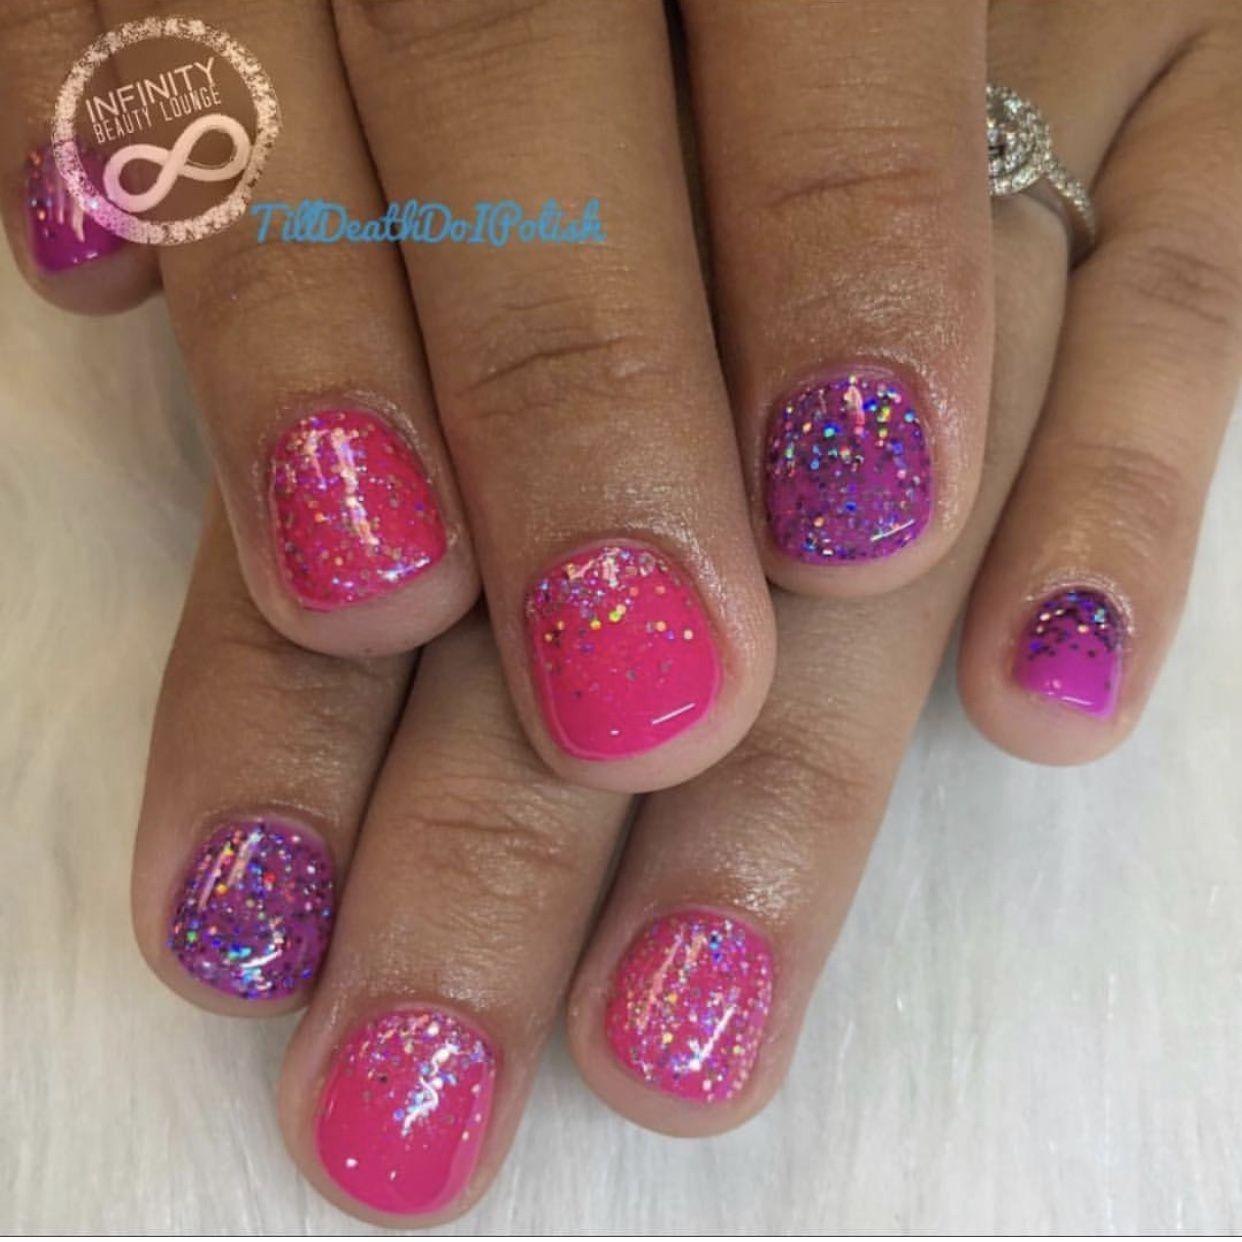 Infinity Beauty Lounge Jax Ph 9042749333 Located at